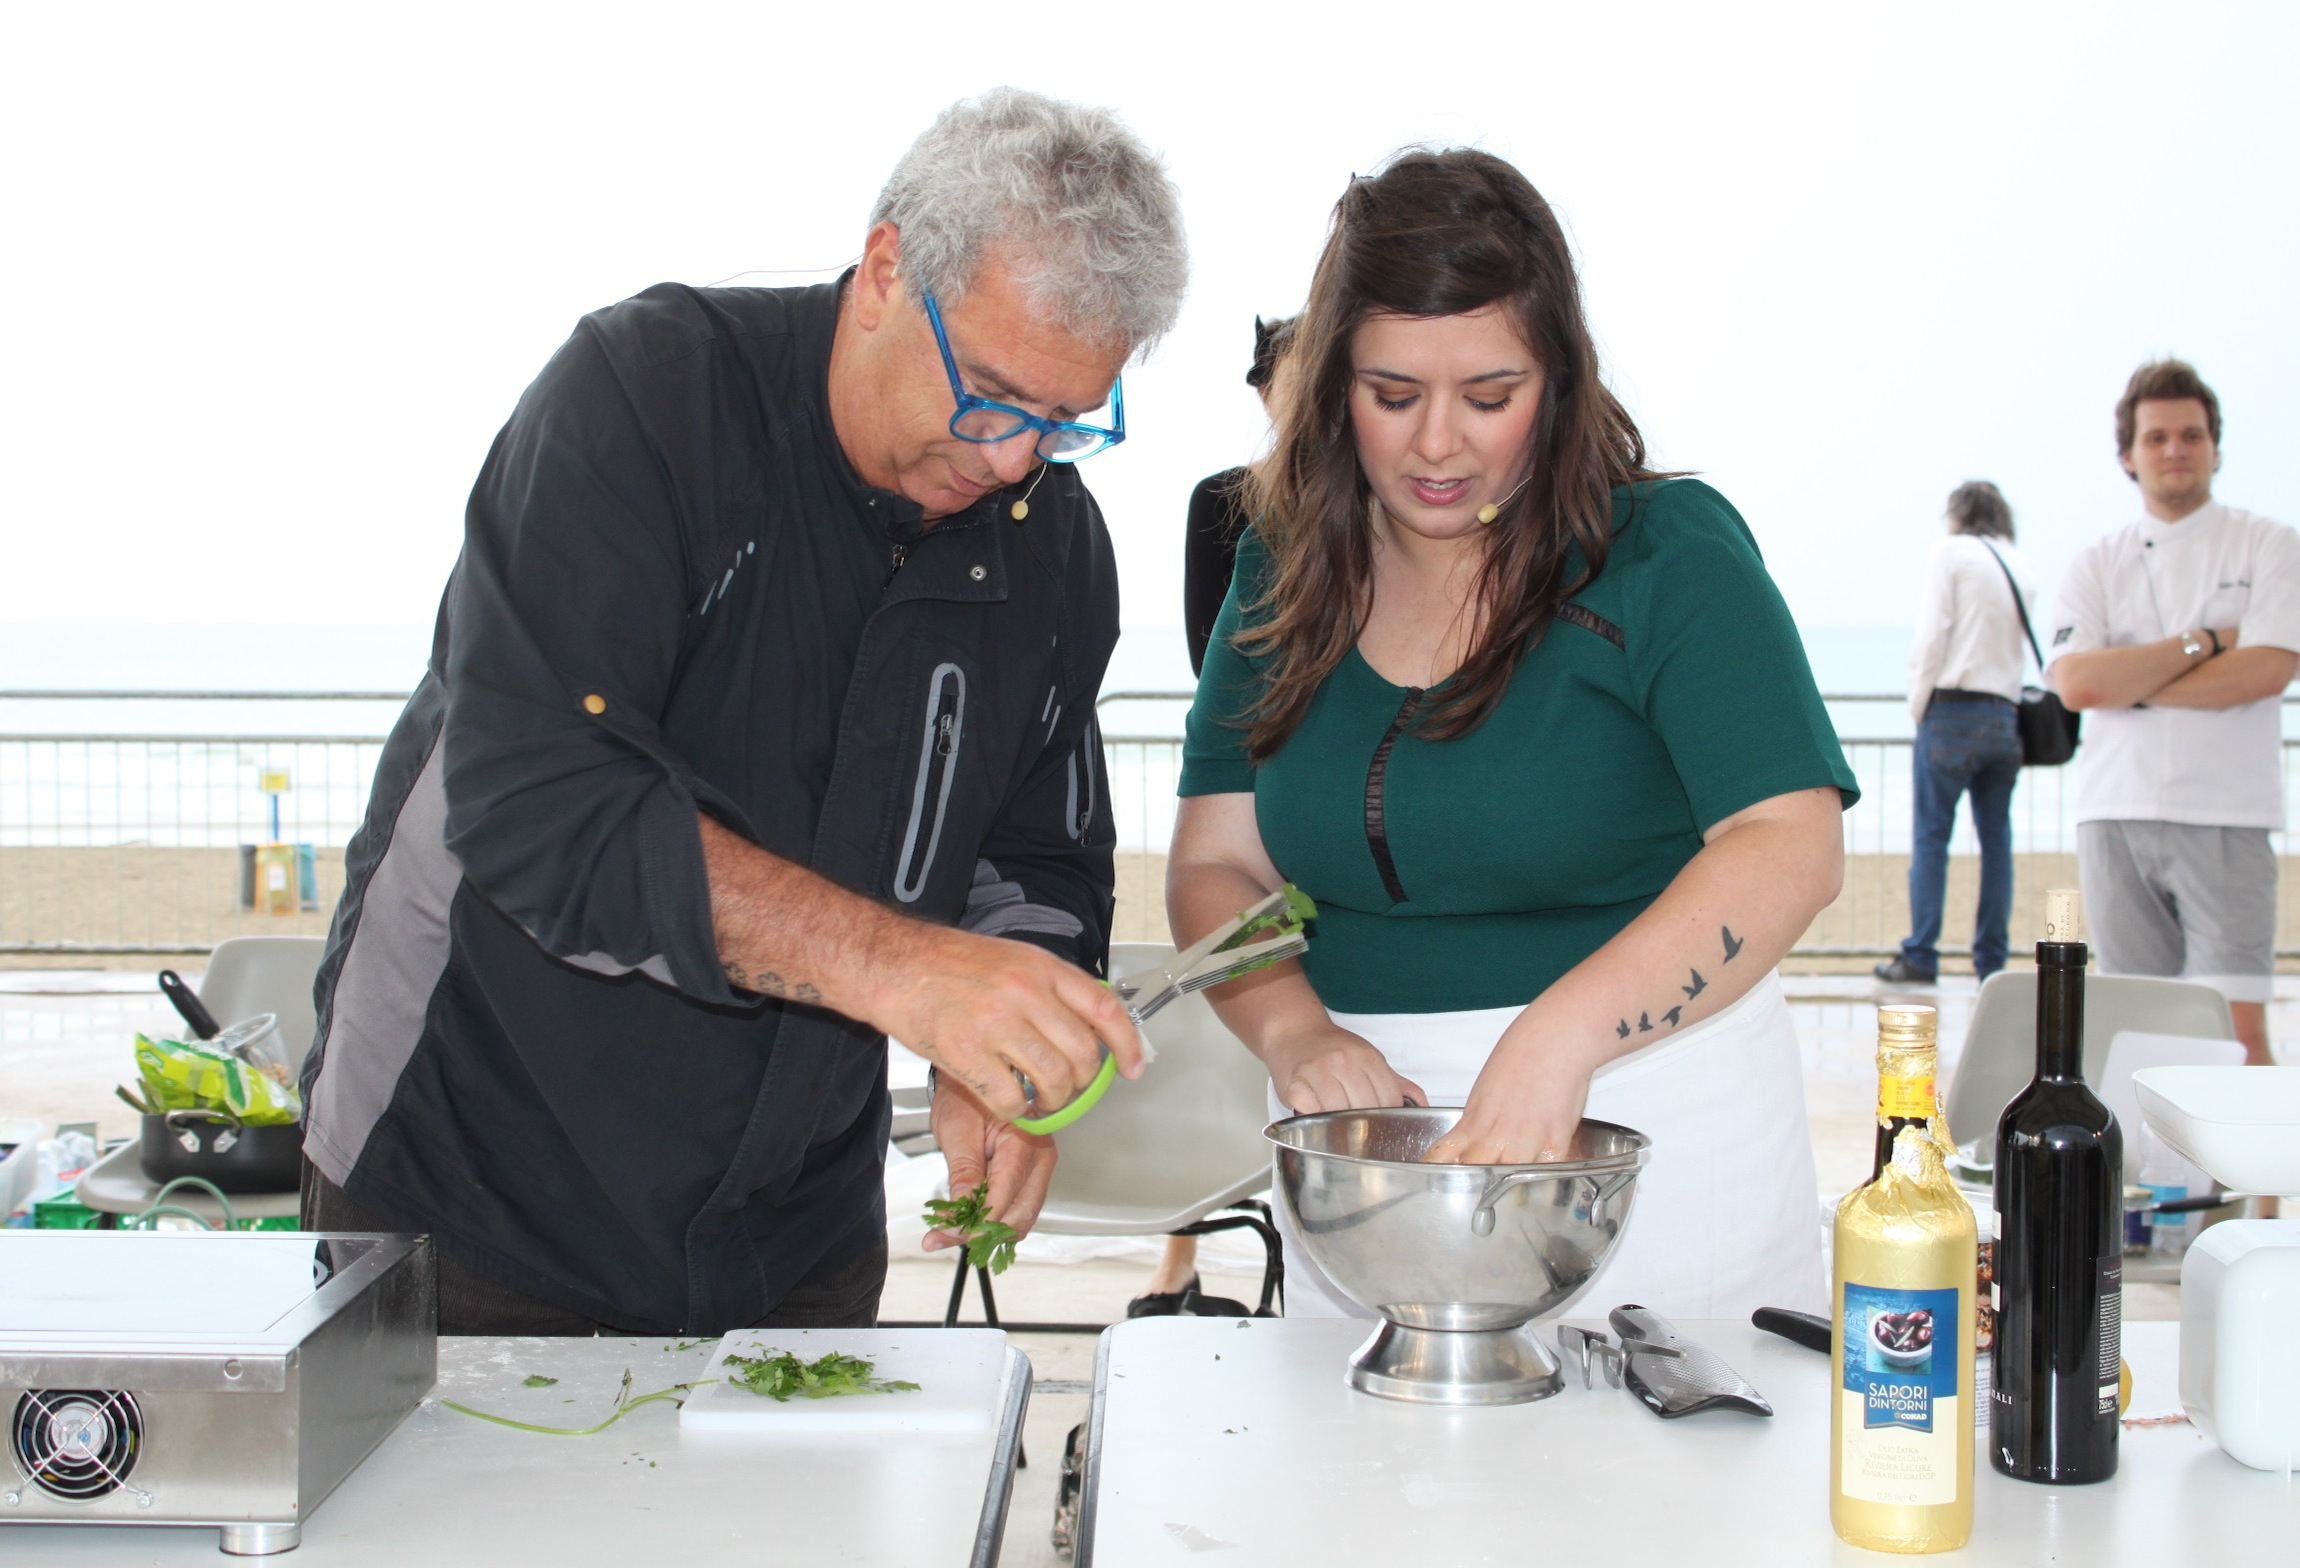 Polpette fritte in salsa tahina realizzate da Claudia Annie ed Igles Corelli